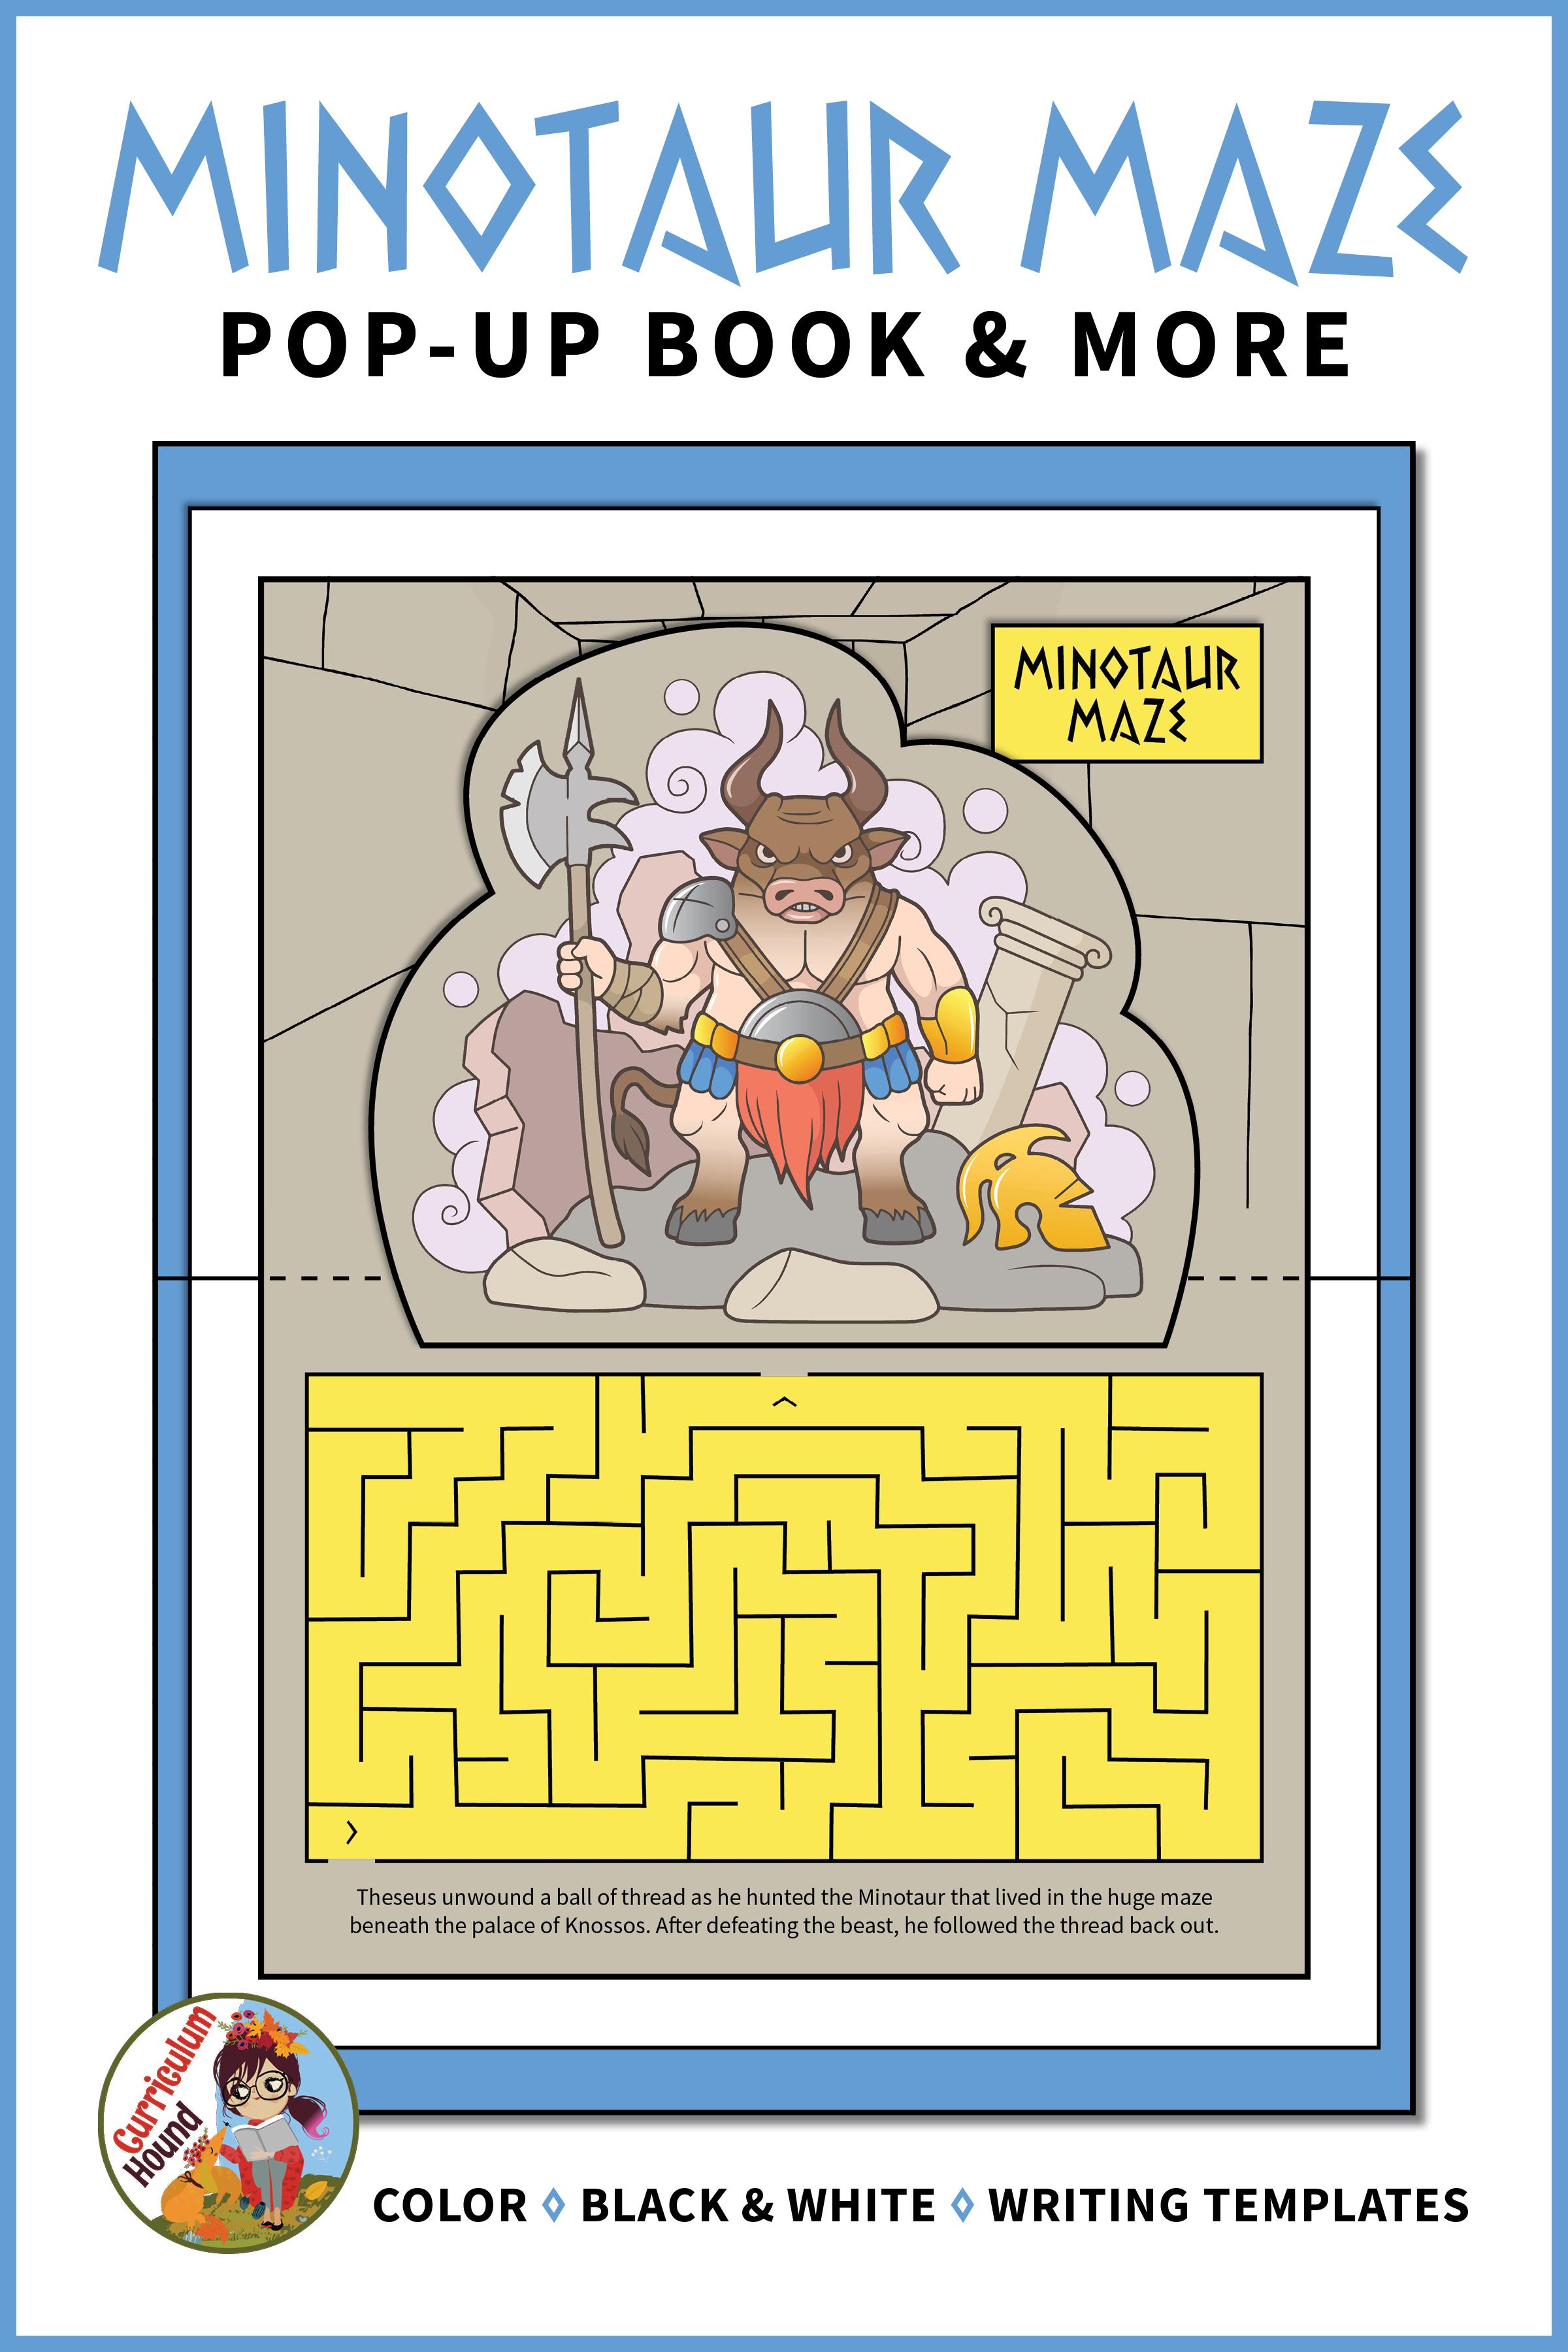 Minotaur Maze Pop Up Book